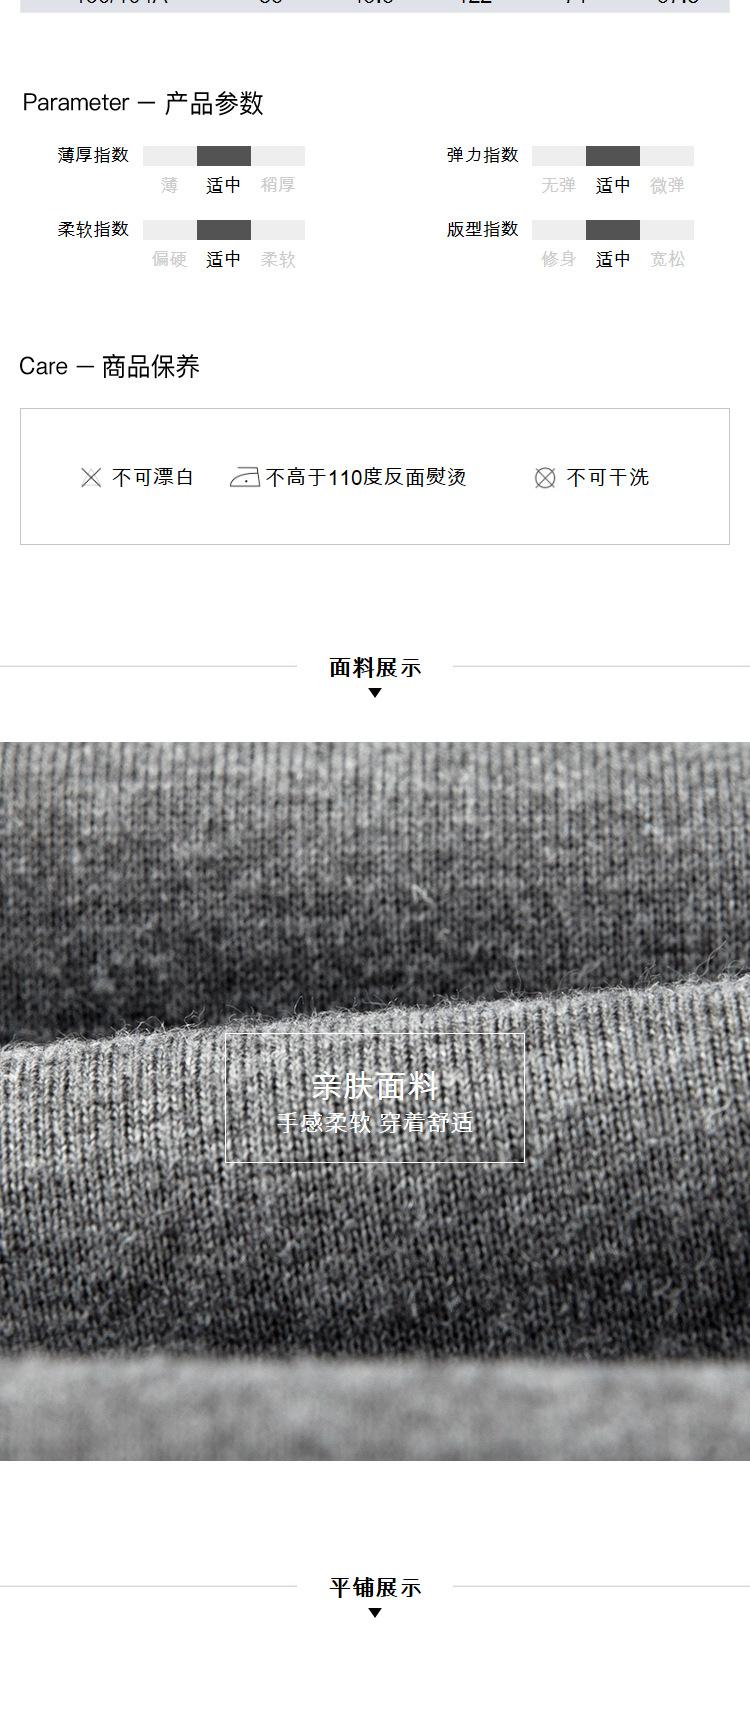 Veste homme en Fibre de polyester Polyester  - Ref 3411621 Image 13